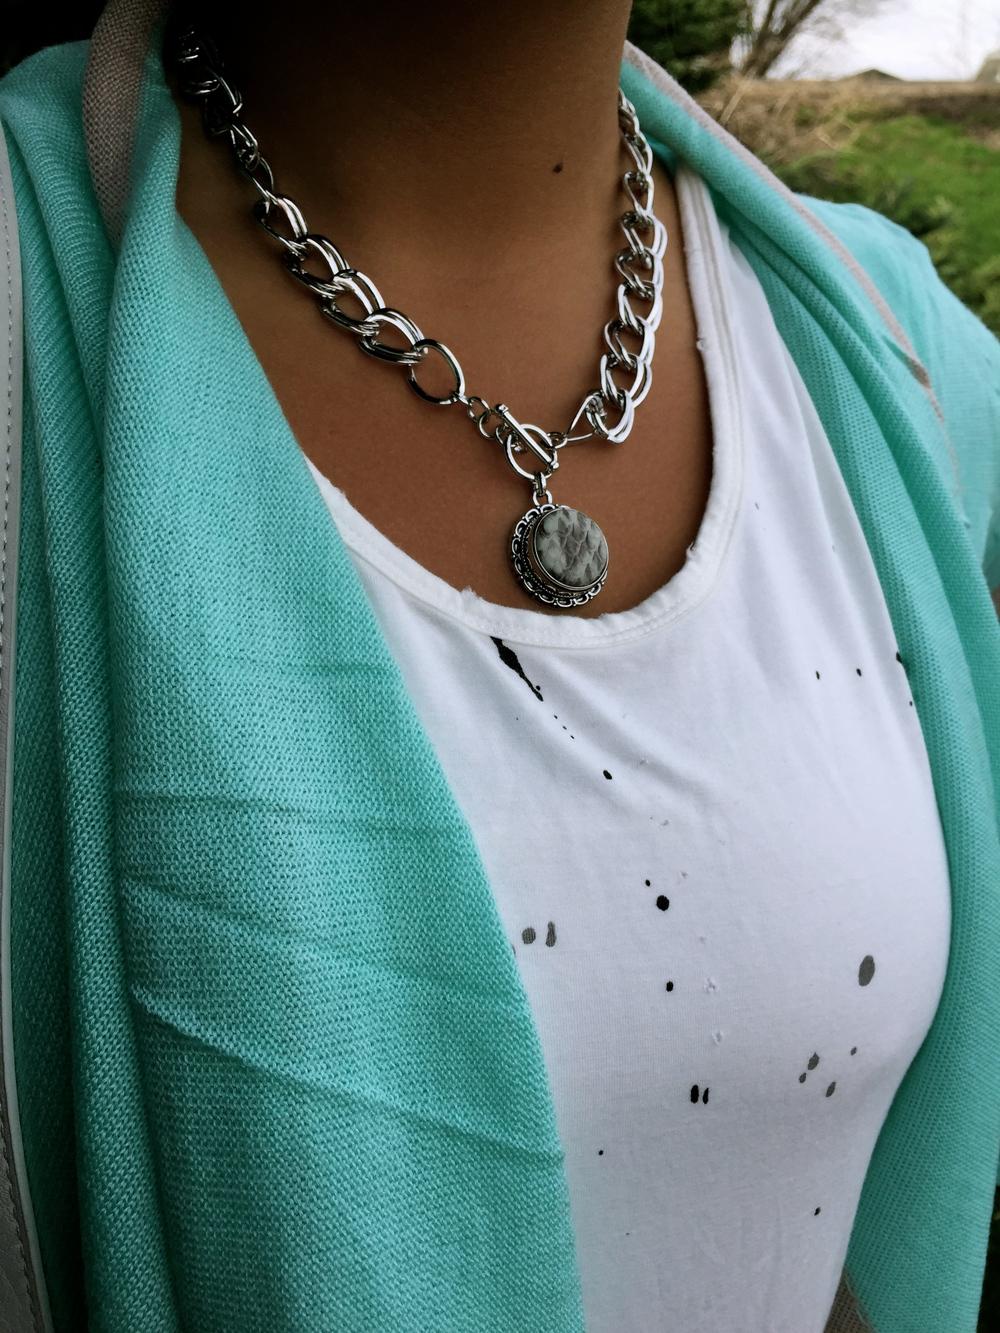 hillaryjewelry.jpeg